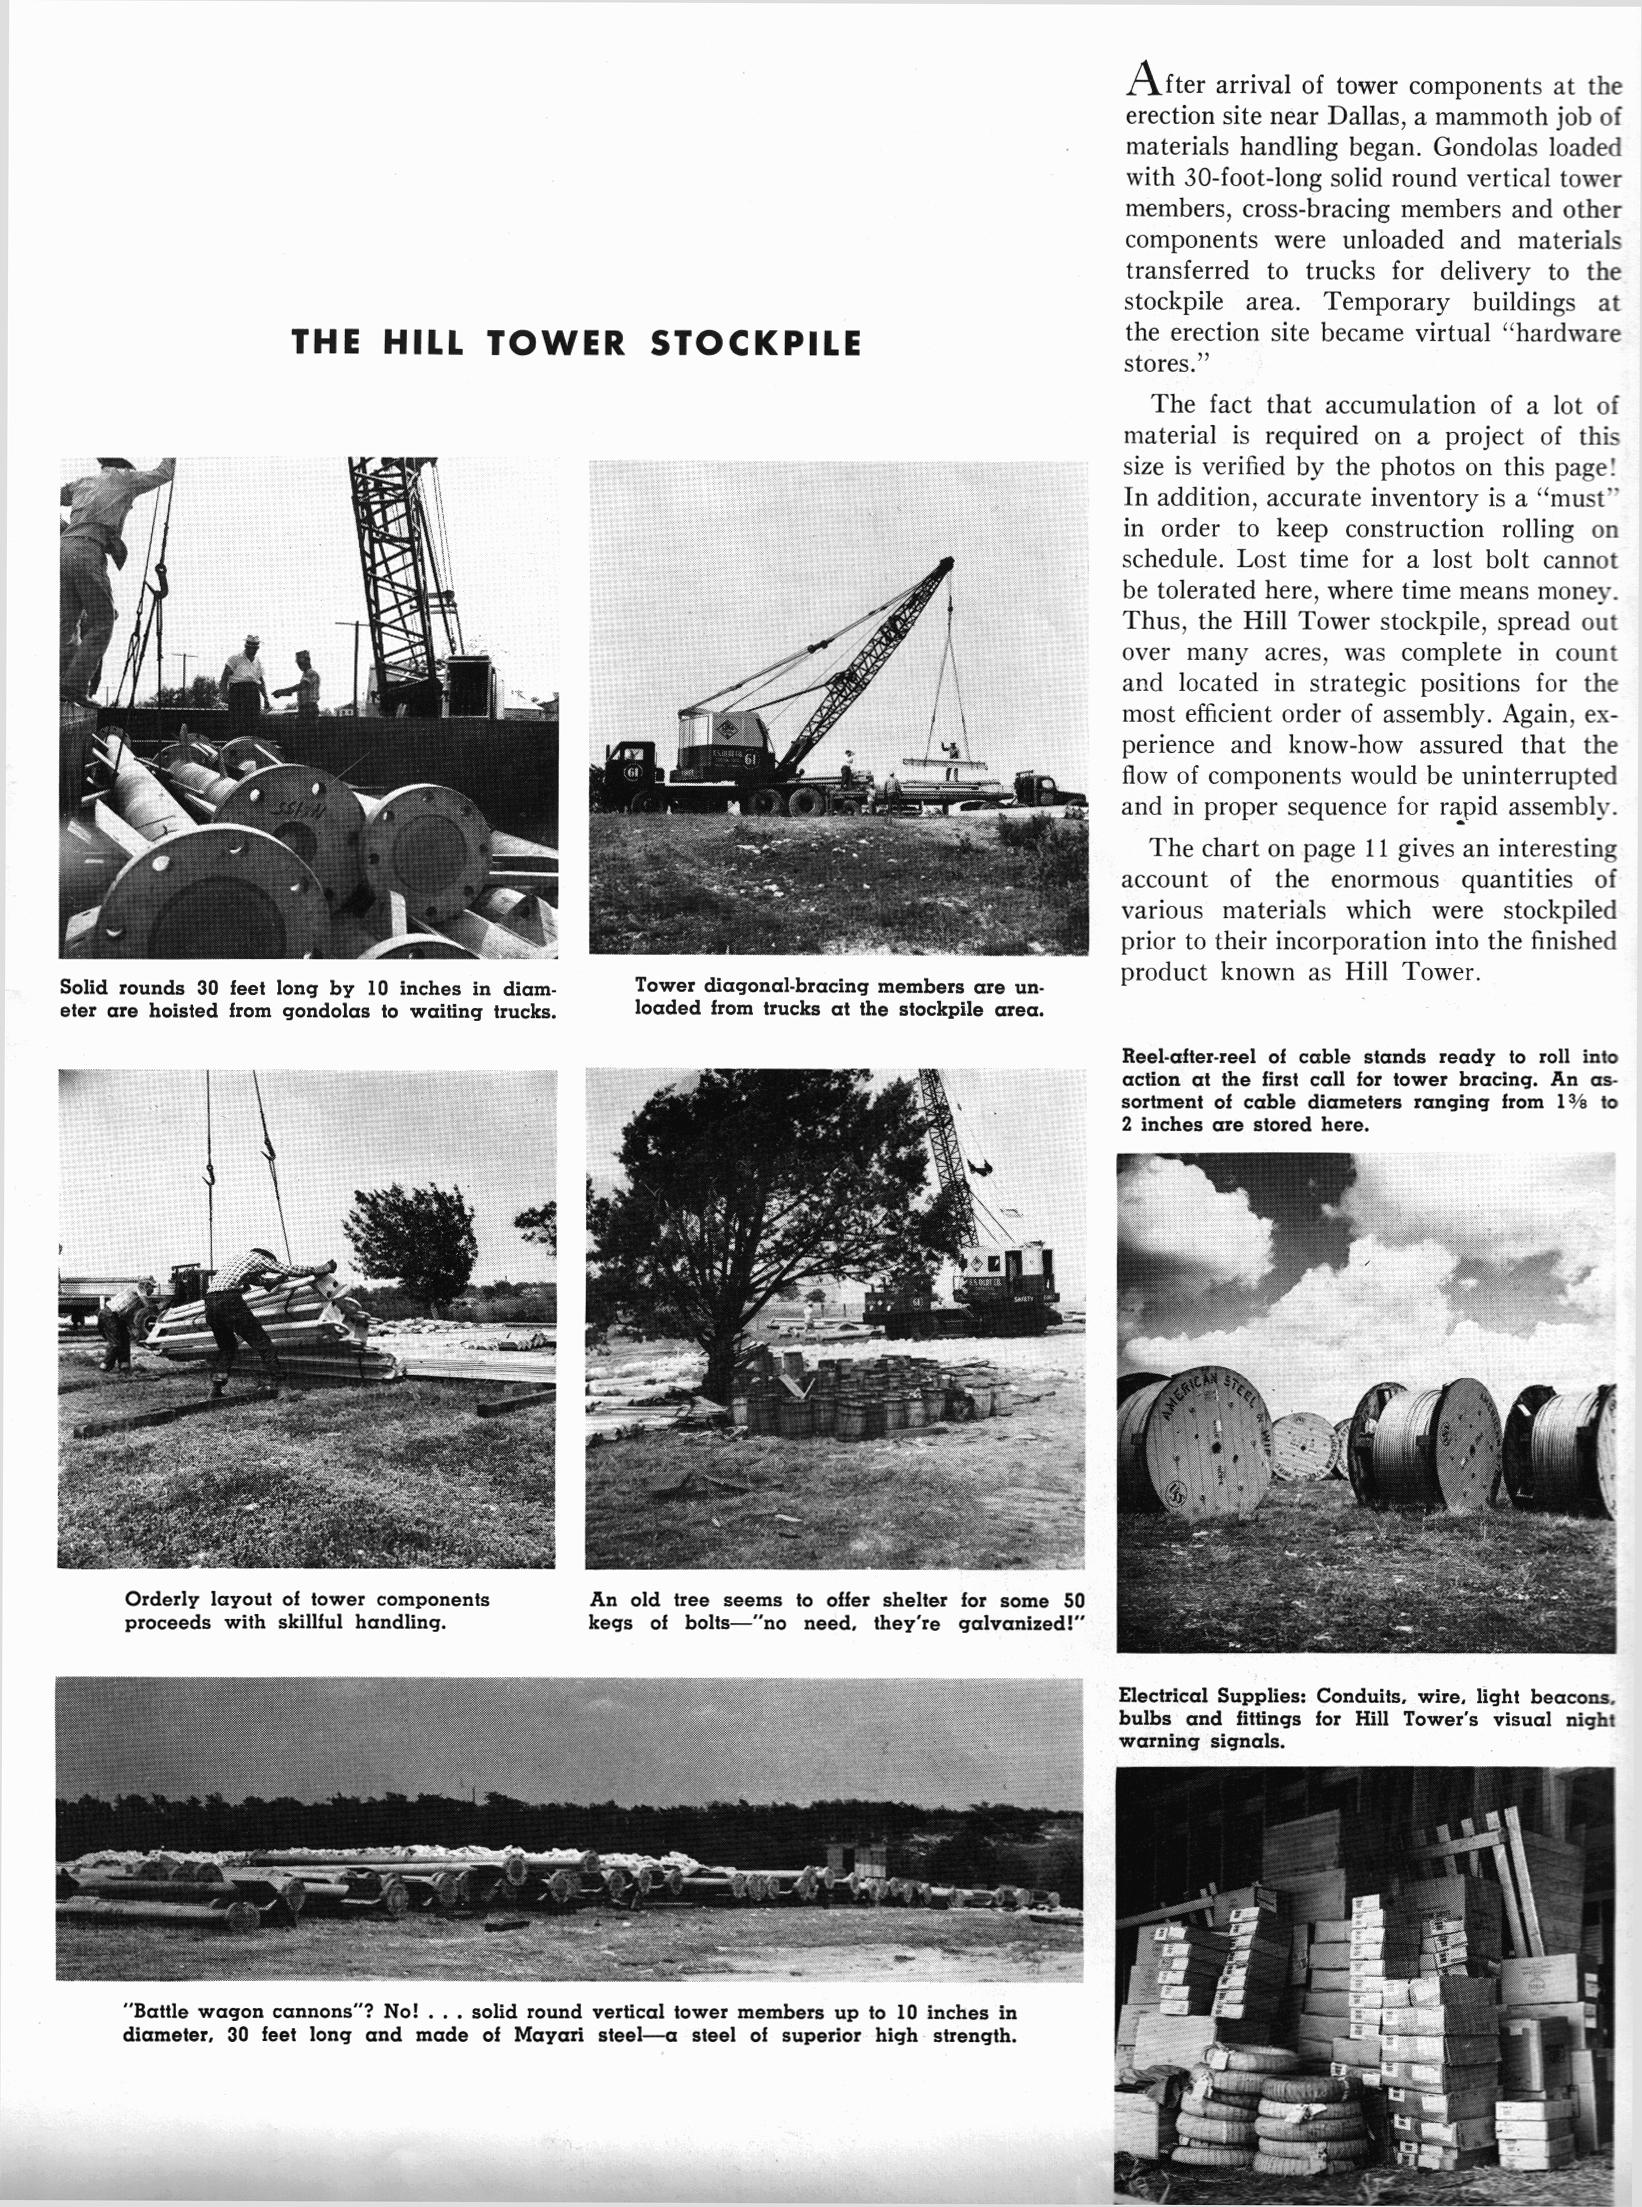 RCA Broadcast News, October 1955